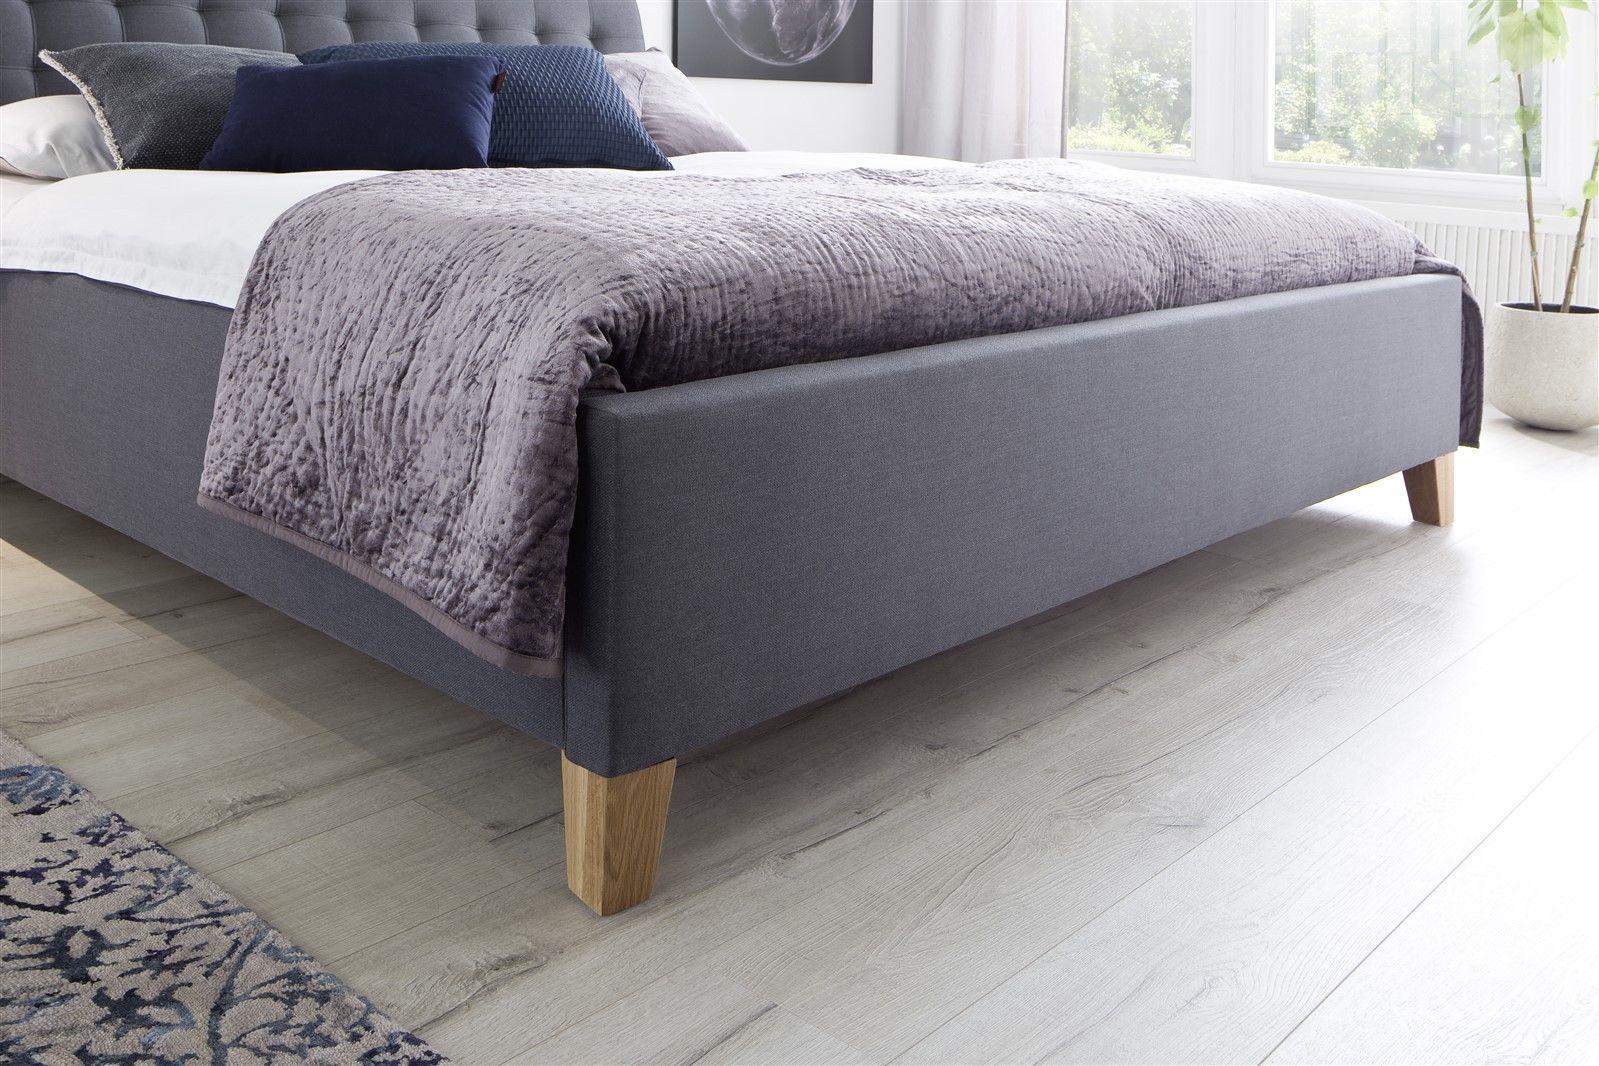 bett grau 180x200 bett chelsea grau 180x200 cm ebay bett. Black Bedroom Furniture Sets. Home Design Ideas